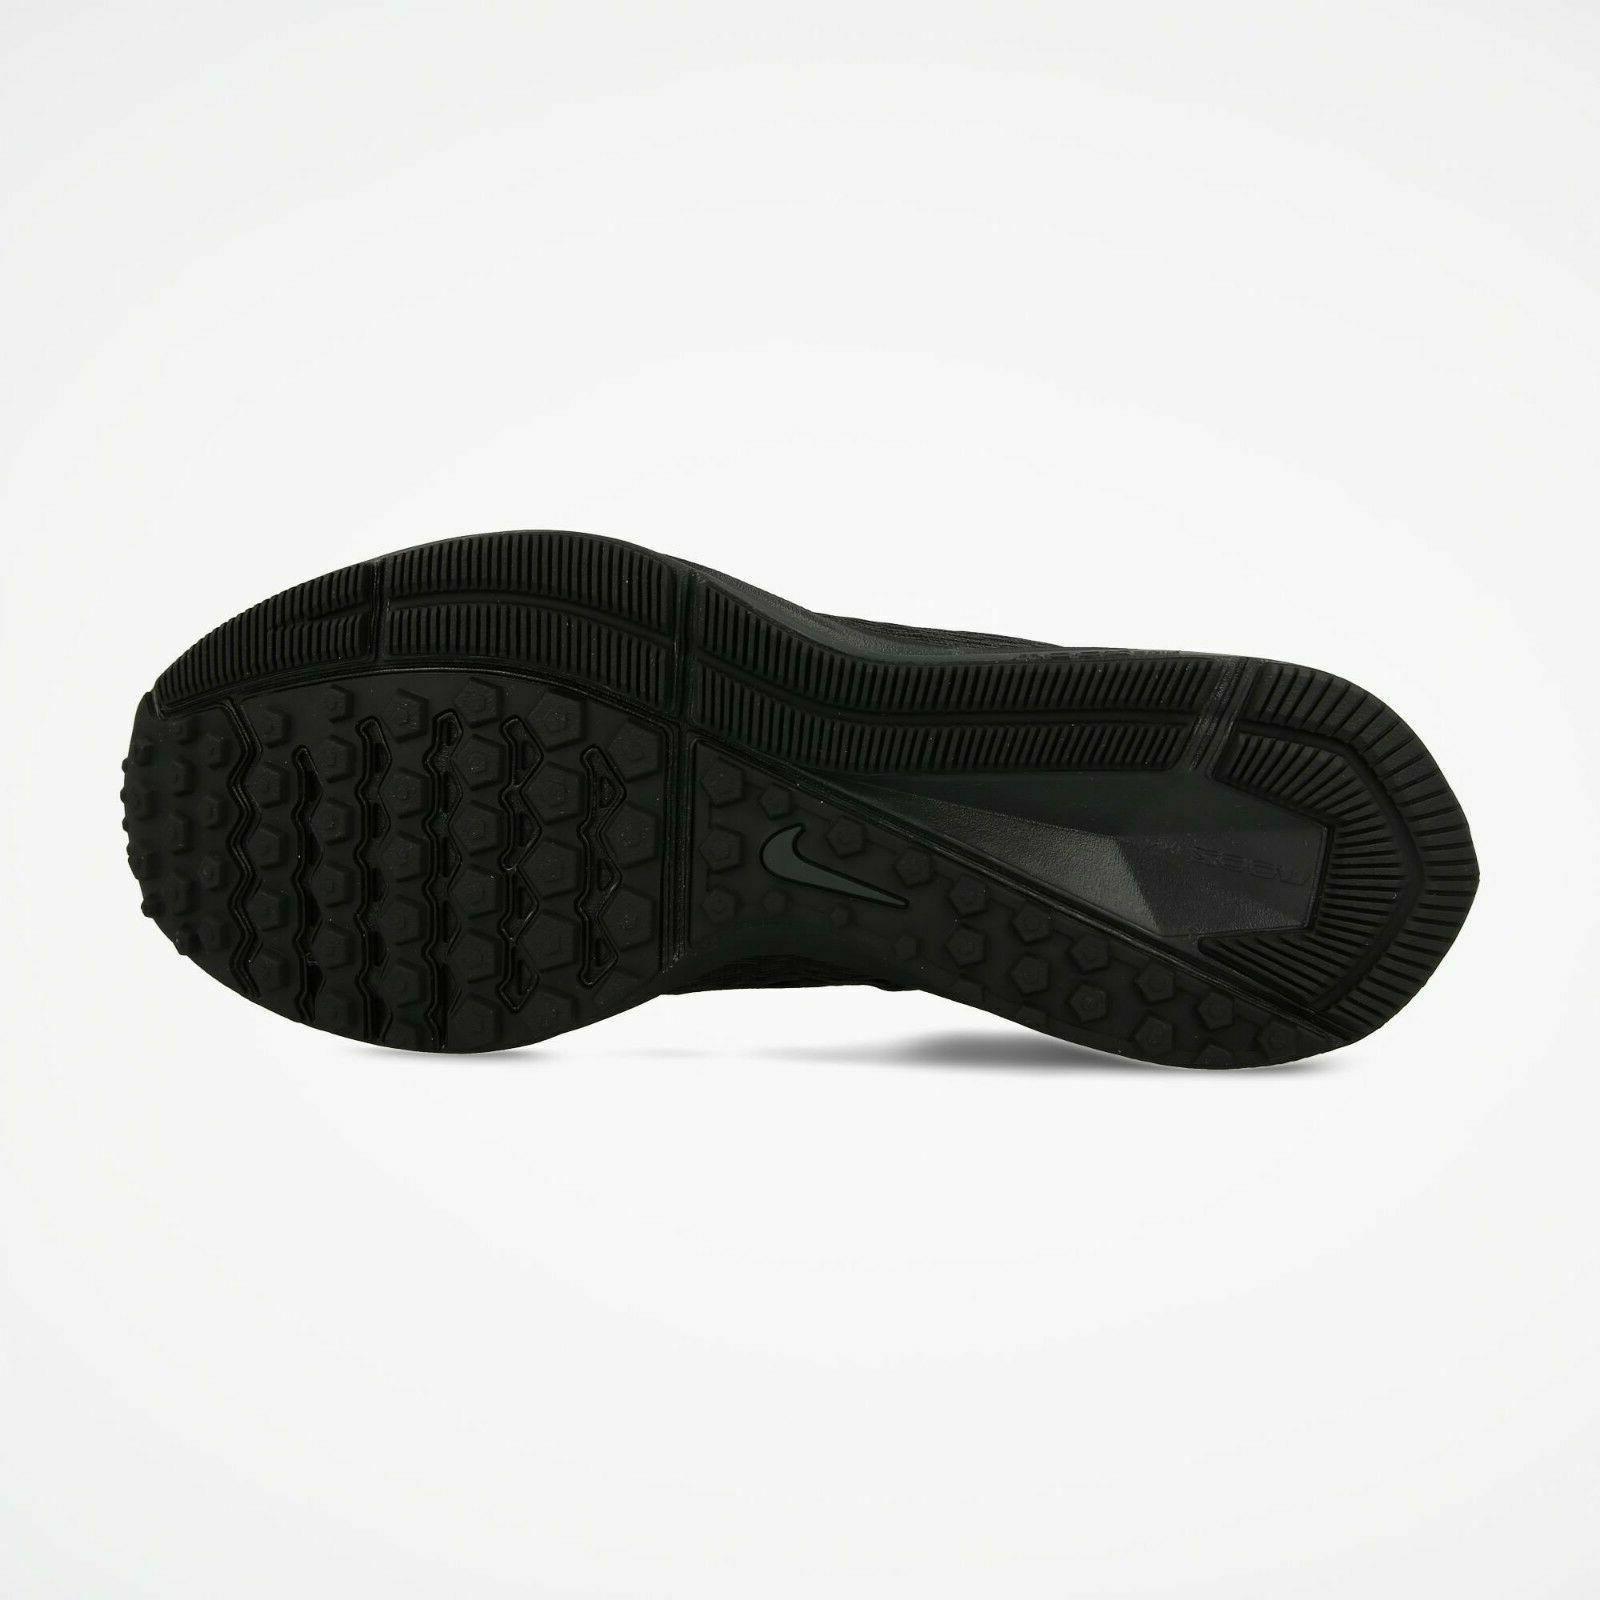 Nike Zoom Winflo AA7406-002